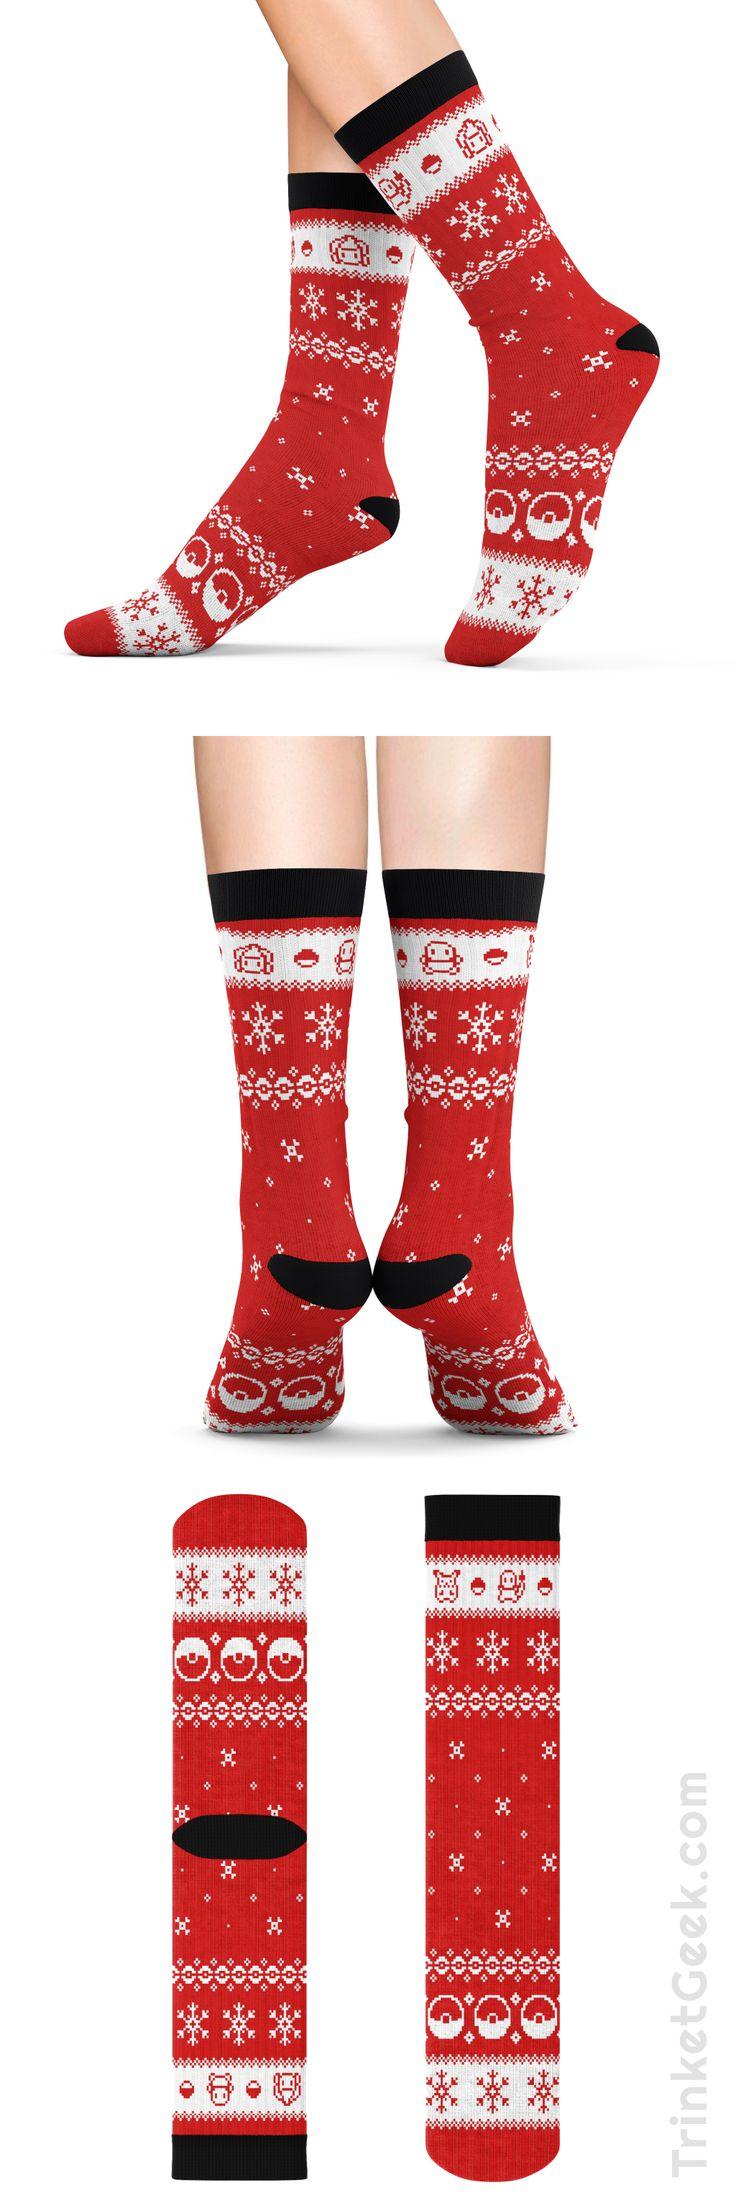 Pokemon themed Christmas Sweater socks!  #pokemon #christmas #sweater #socks #stocking #stuffer